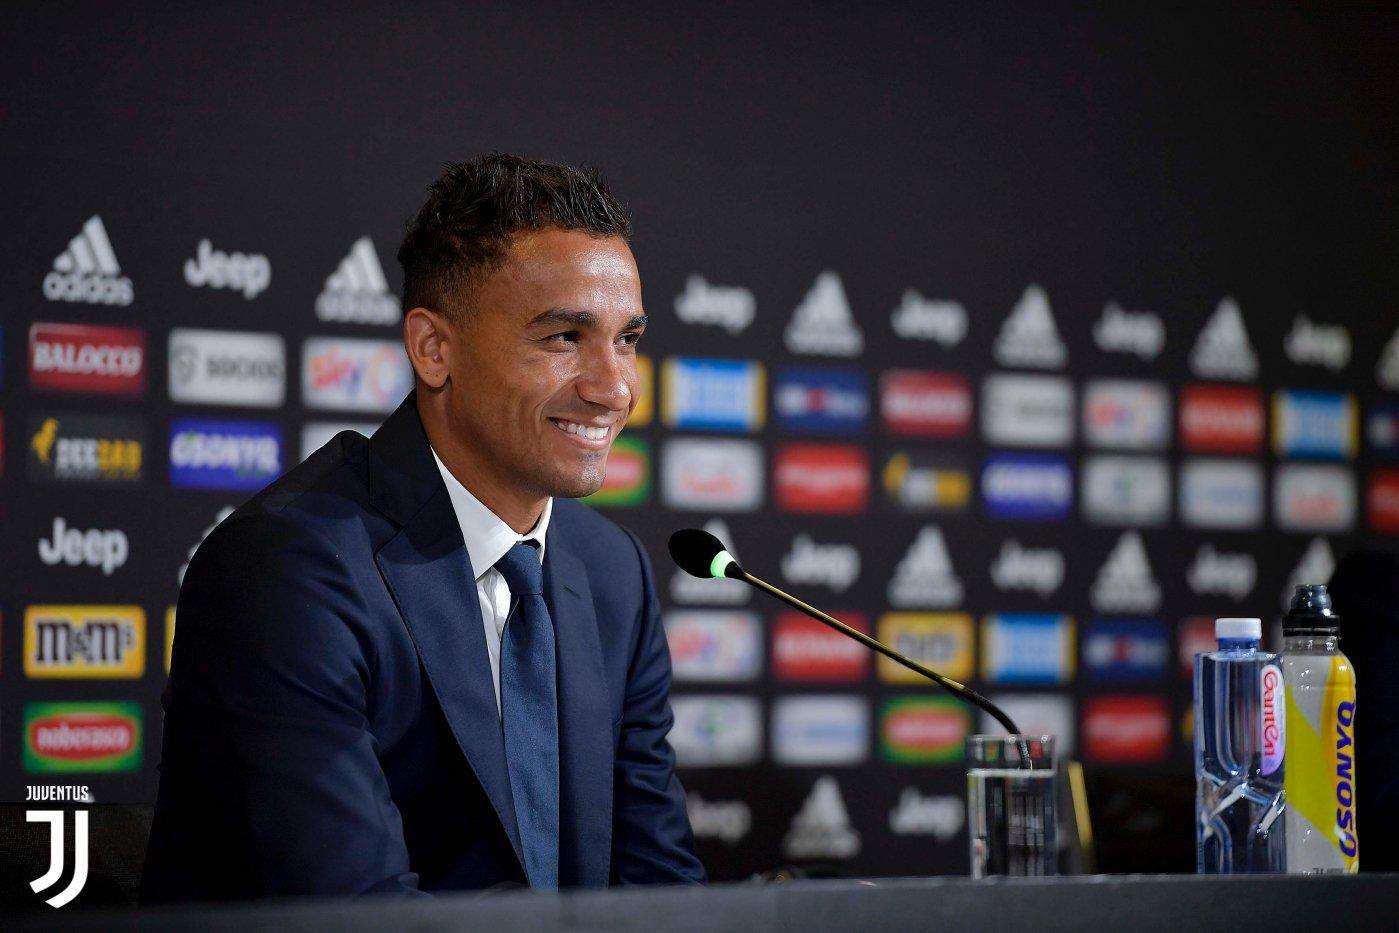 Danilo e Cristiano Ronaldo Juventus